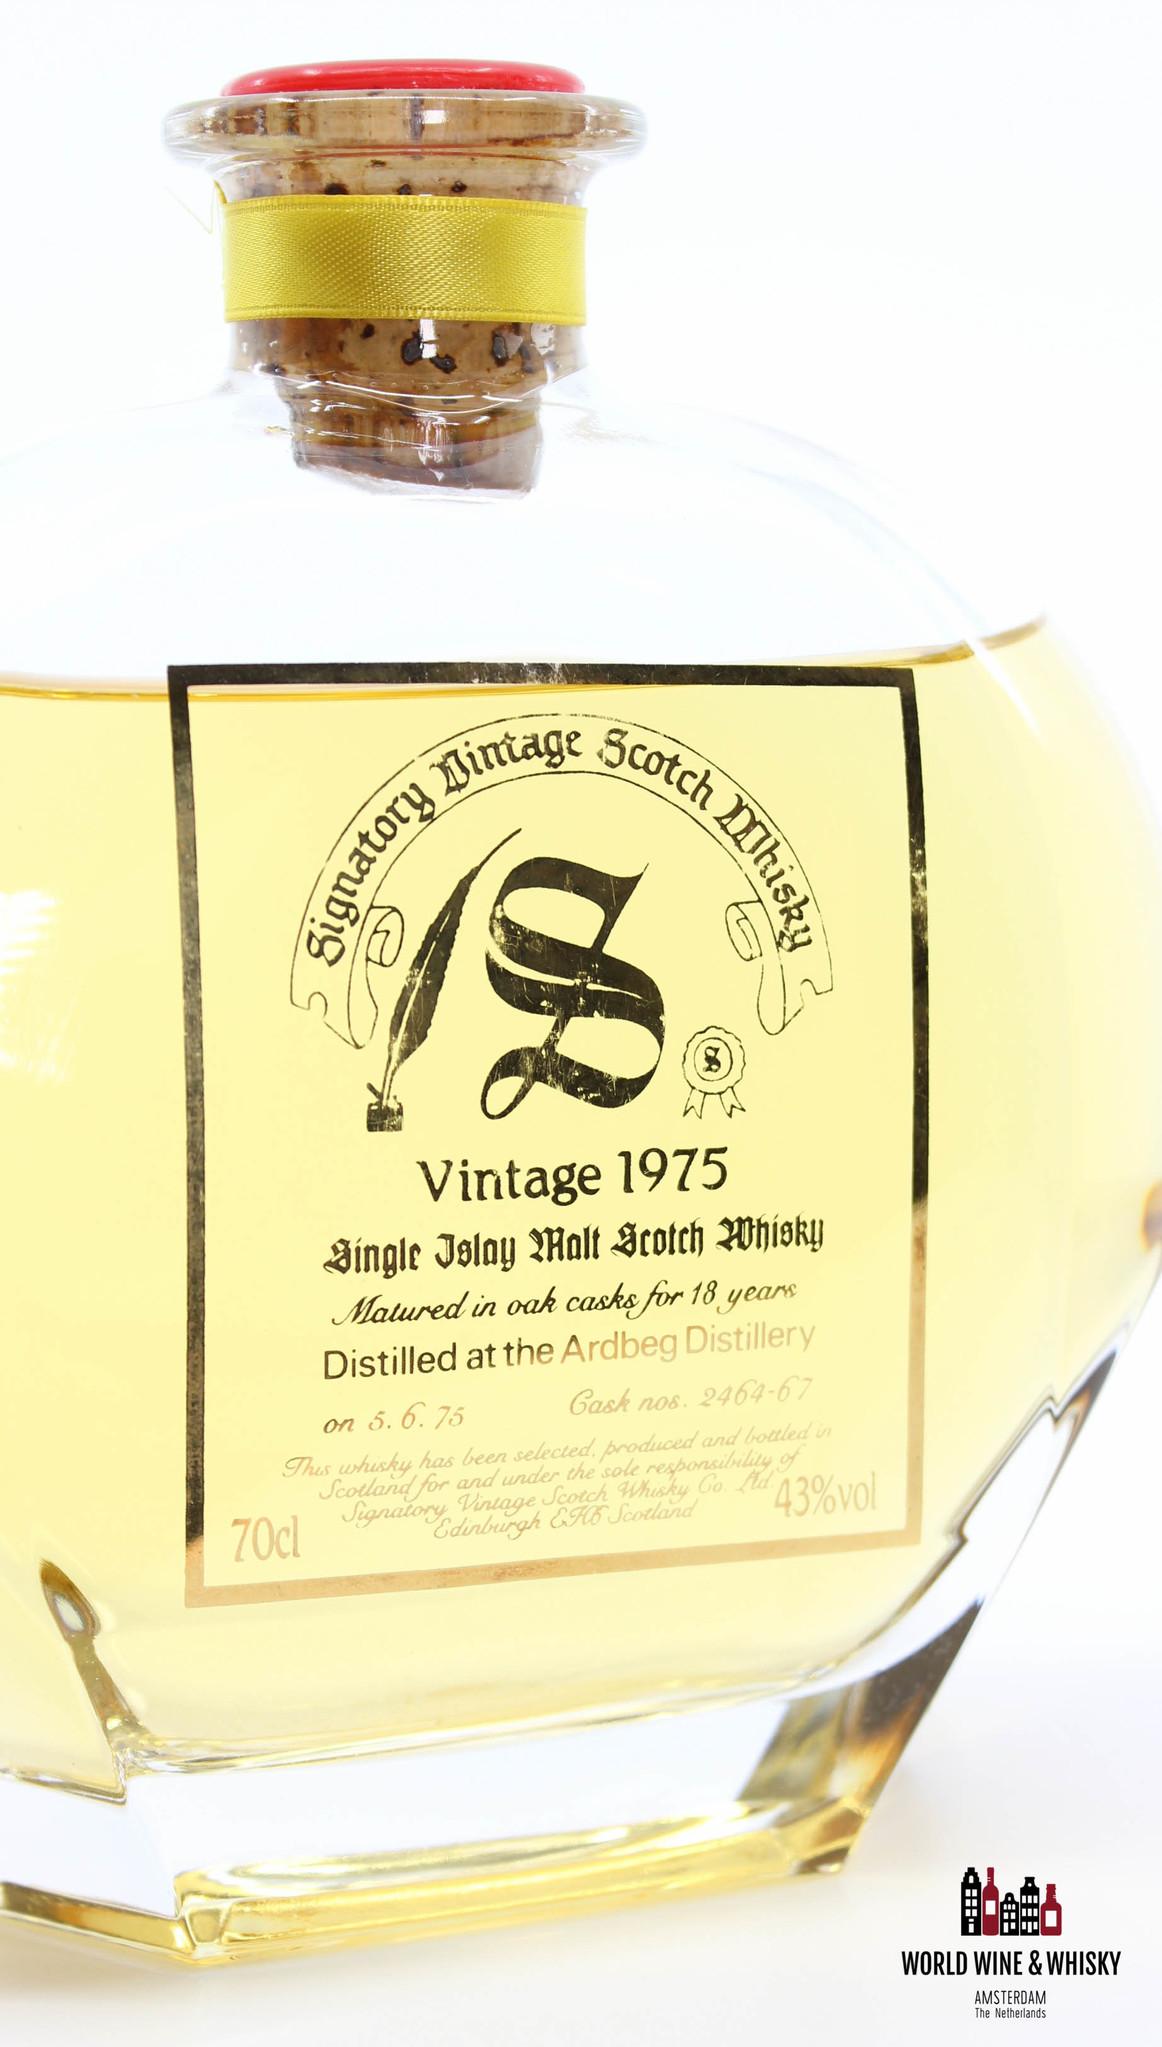 Ardbeg Ardbeg 18 Years Old 1975 1993 Decanter Collection - Signatory Vintage - Cask 2464-67 43%